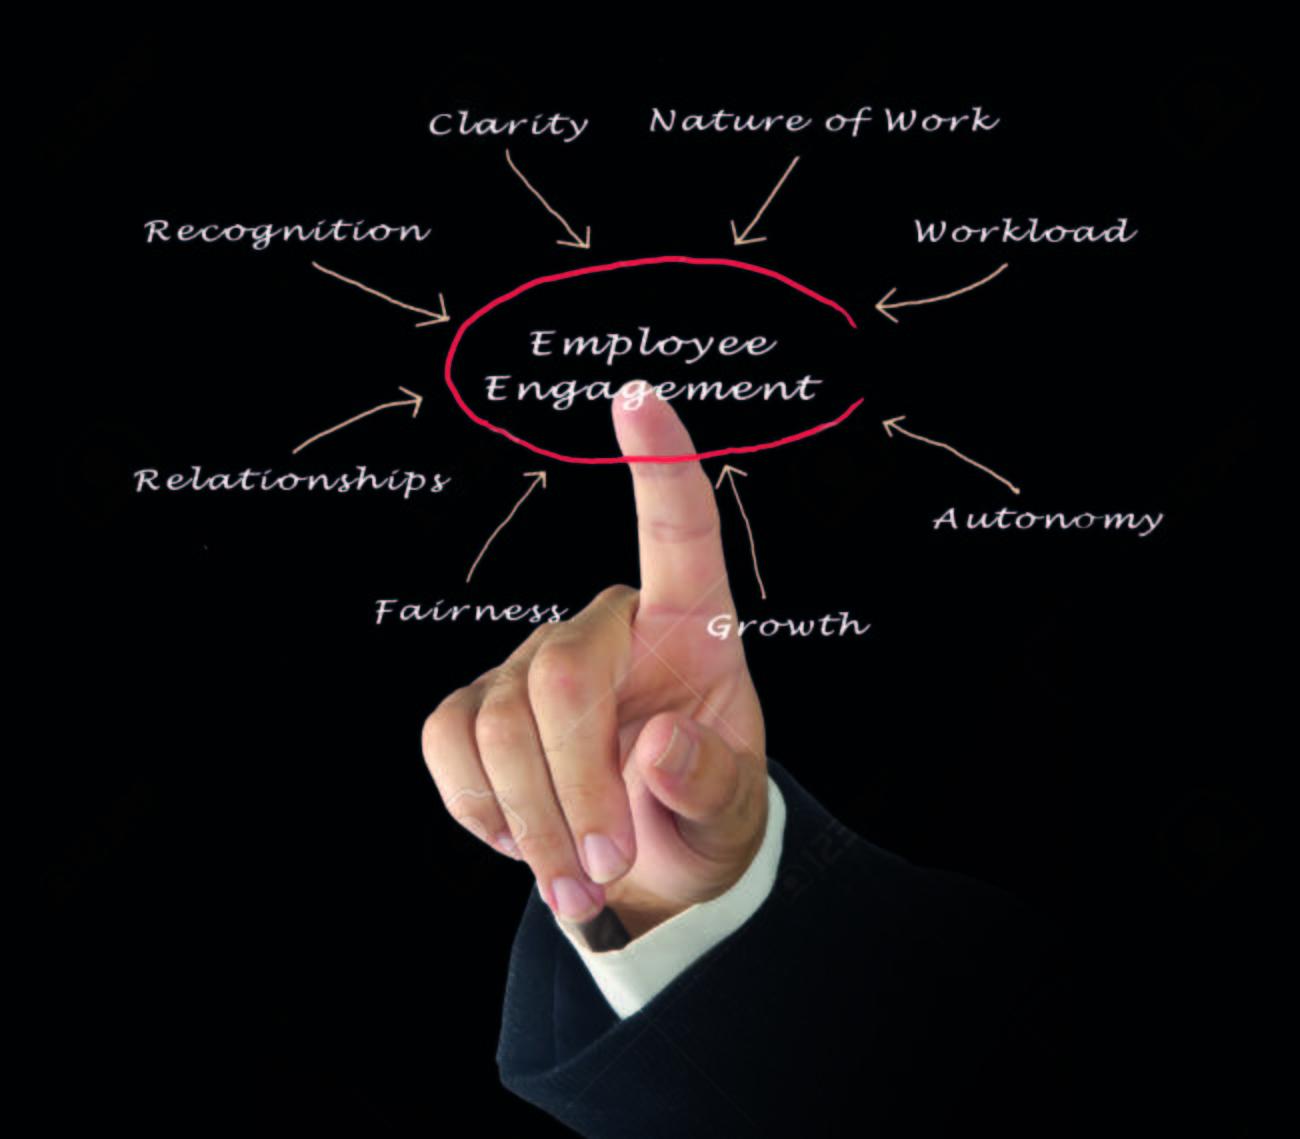 employee engagement Stock Photo - 29342027